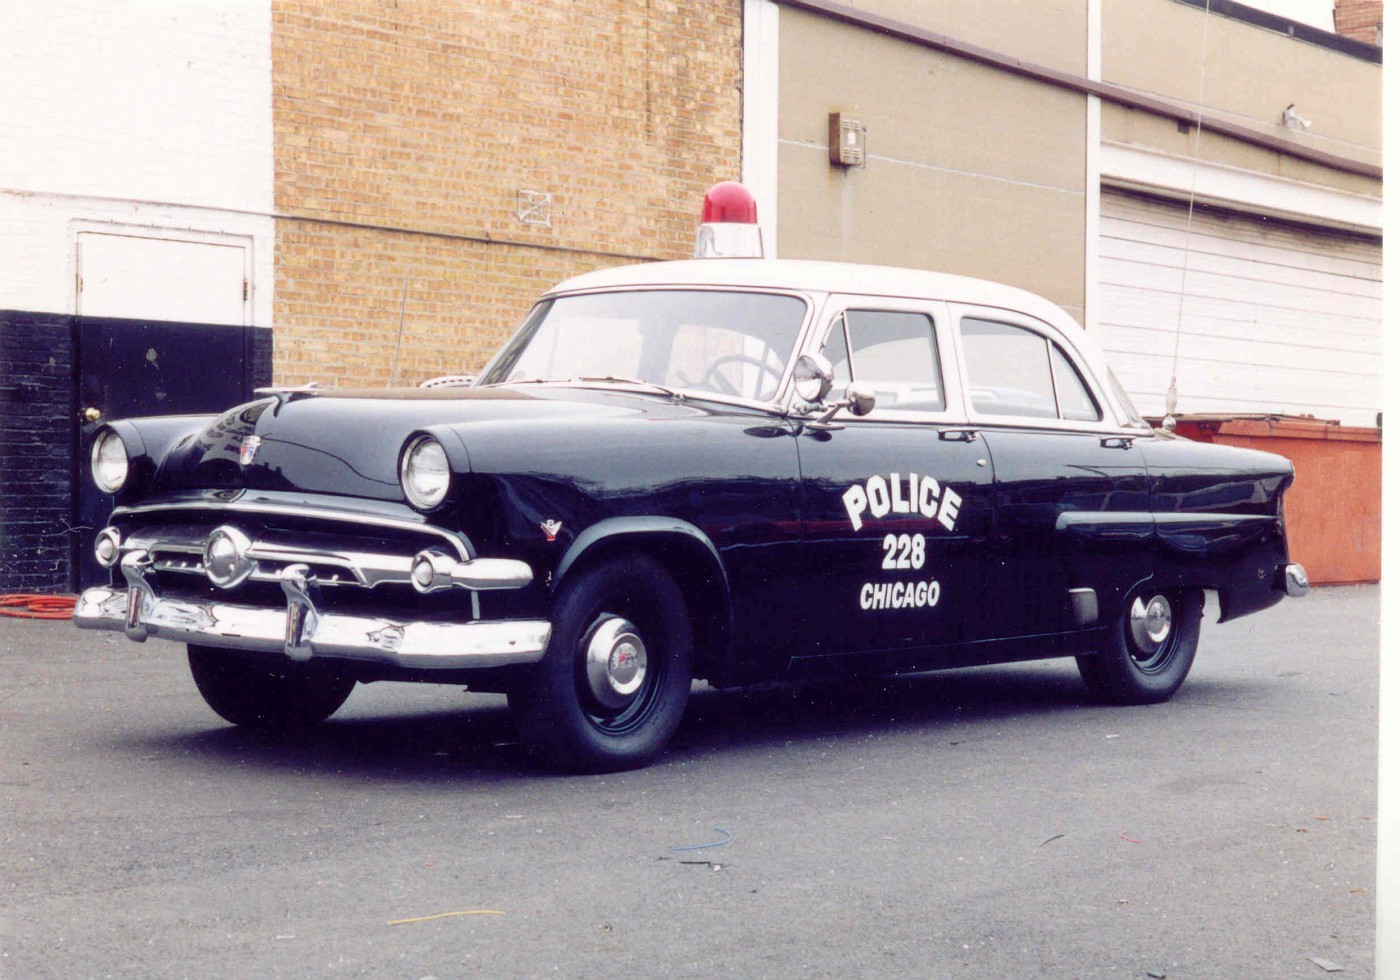 Mercedes Dealers In Chicago >> Parin Shah Chicago Motor Cars - impremedia.net